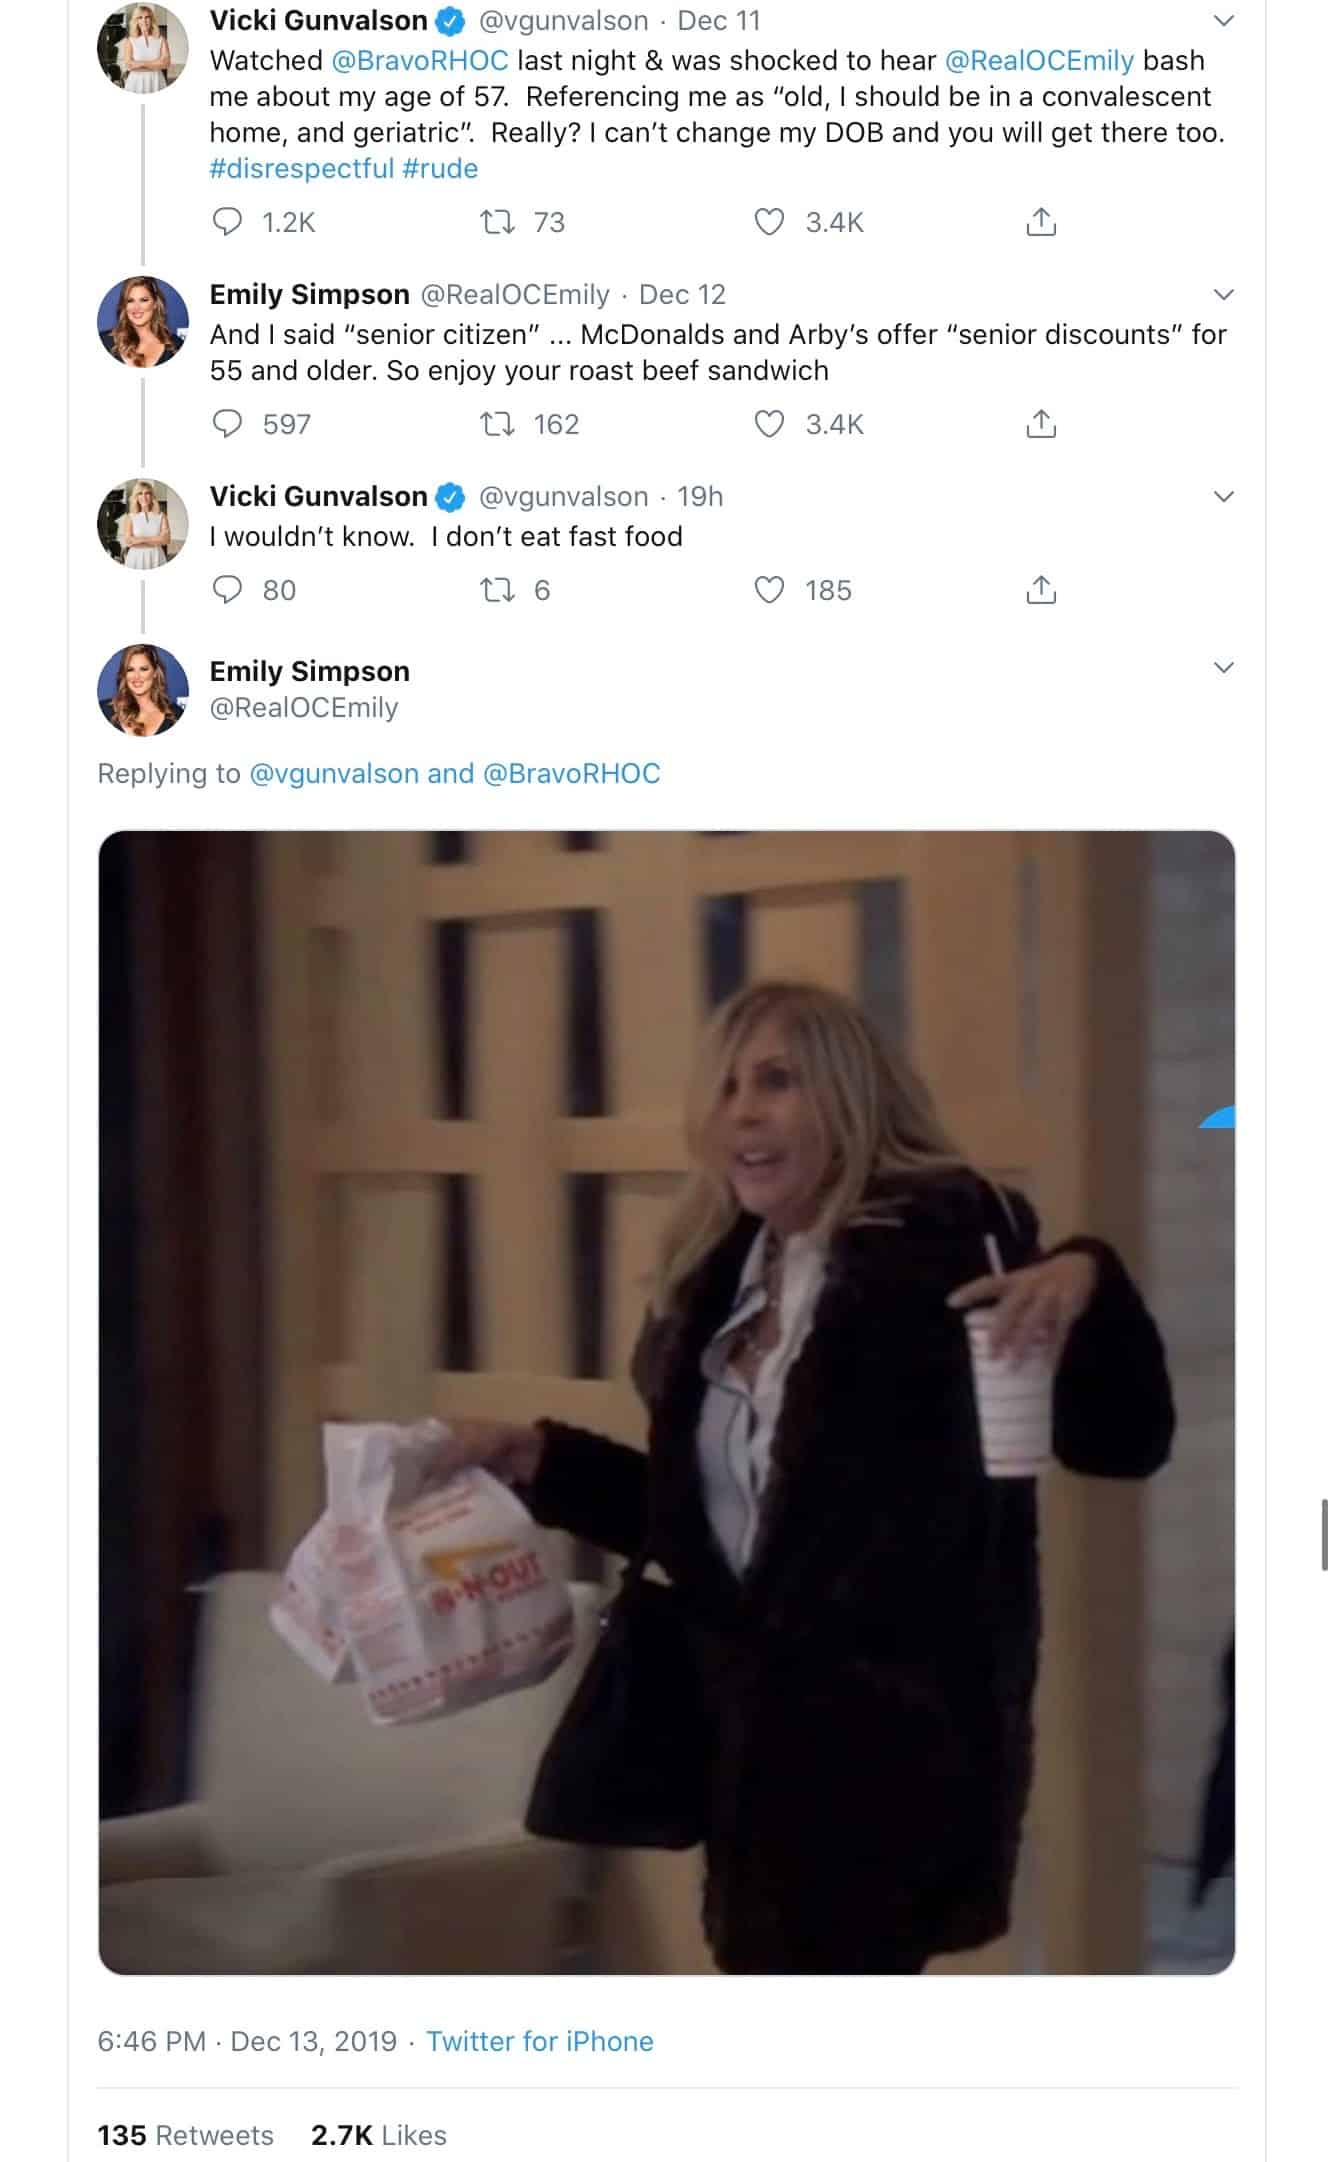 Emily Simpson slams Vicki Gunvalson in Twitter Feud